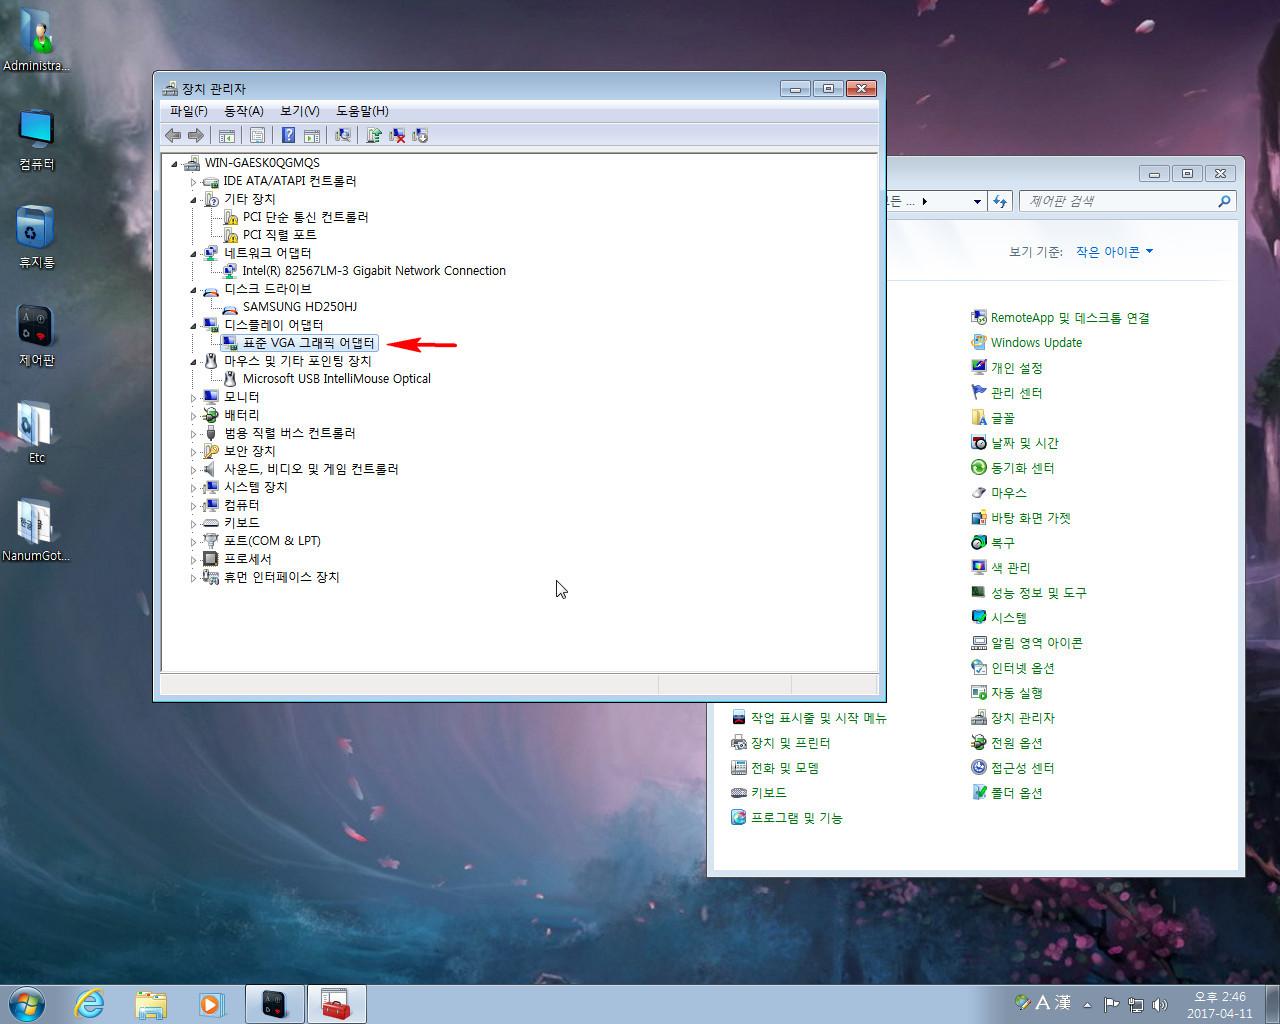 Windows 7 Ultimate_x64_Lite_KO_KY_OldMaC14.jpg